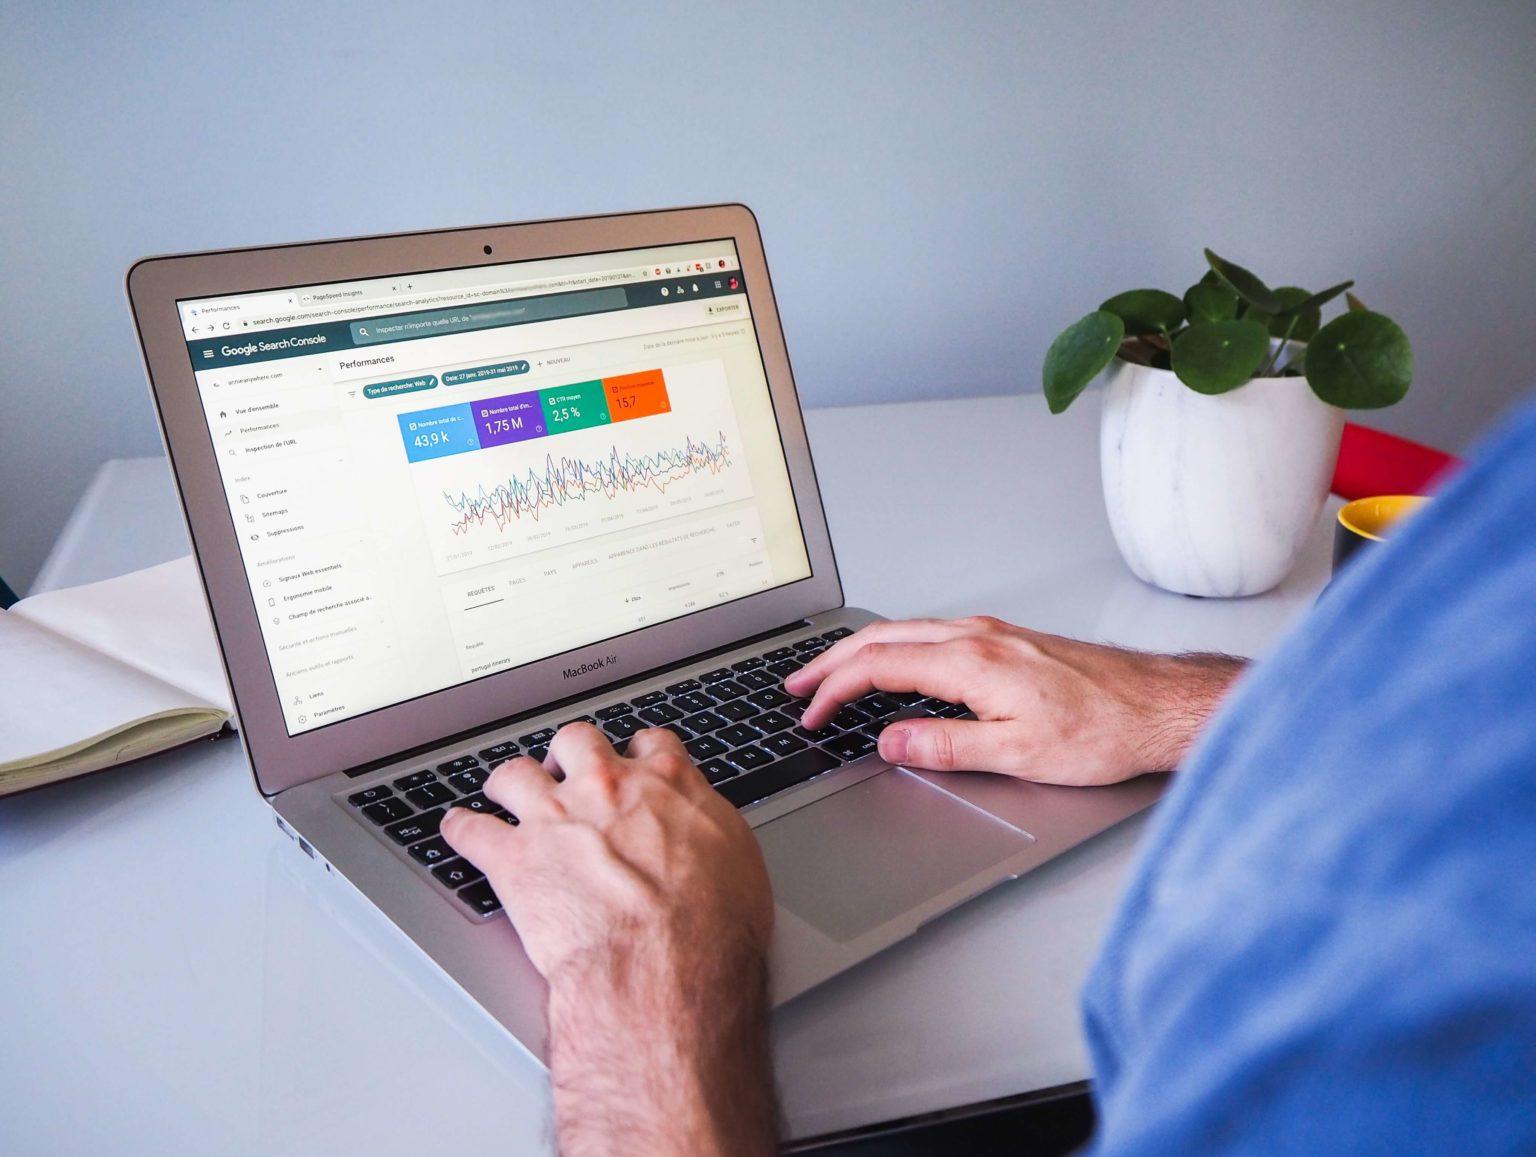 Macbook Air mit Google Search Console